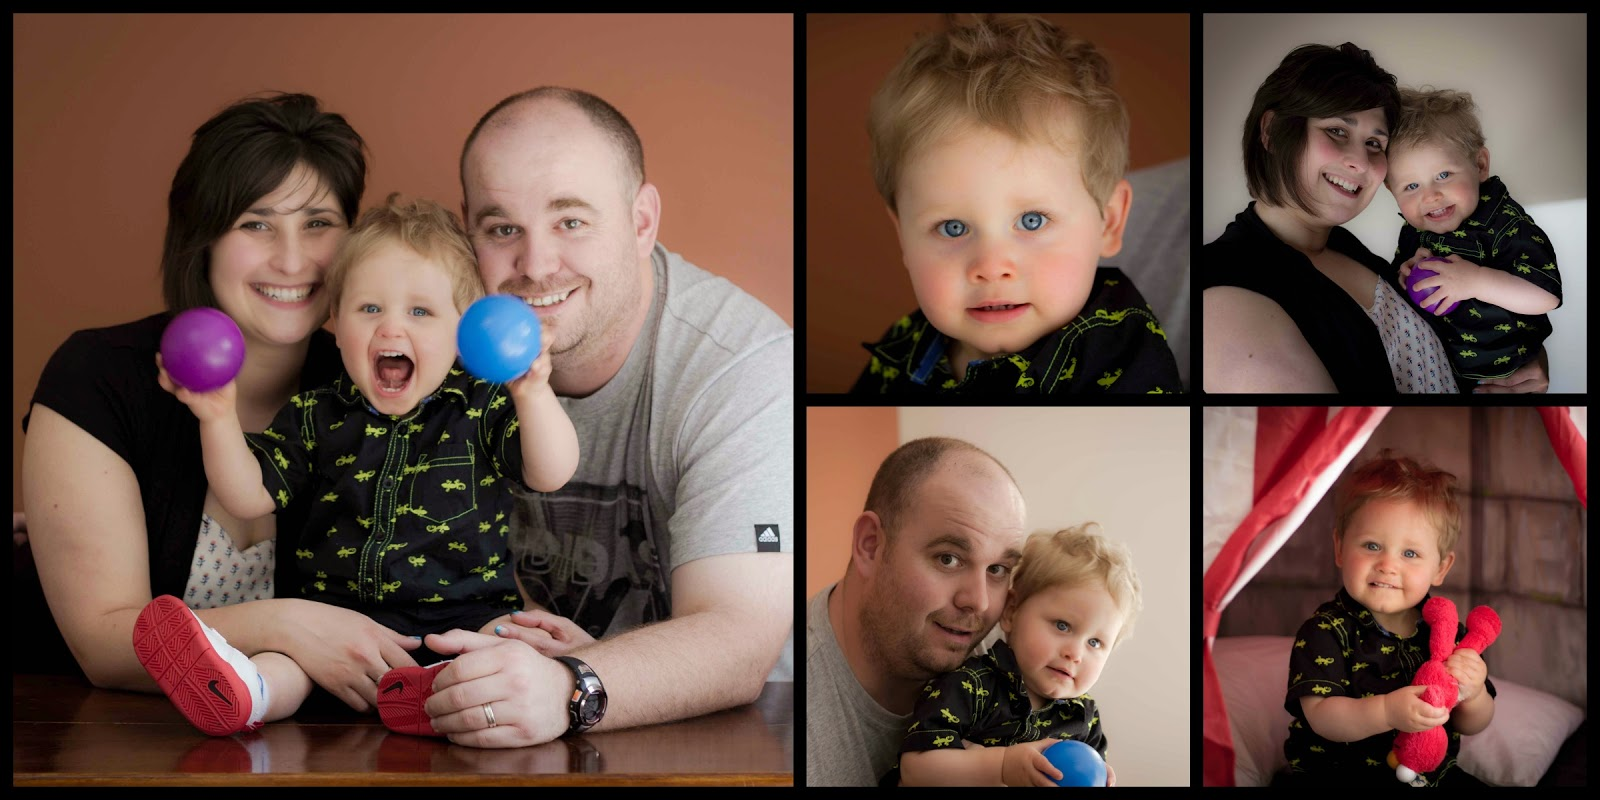 Family Photography - copyright Maria Mastrogiuseppe